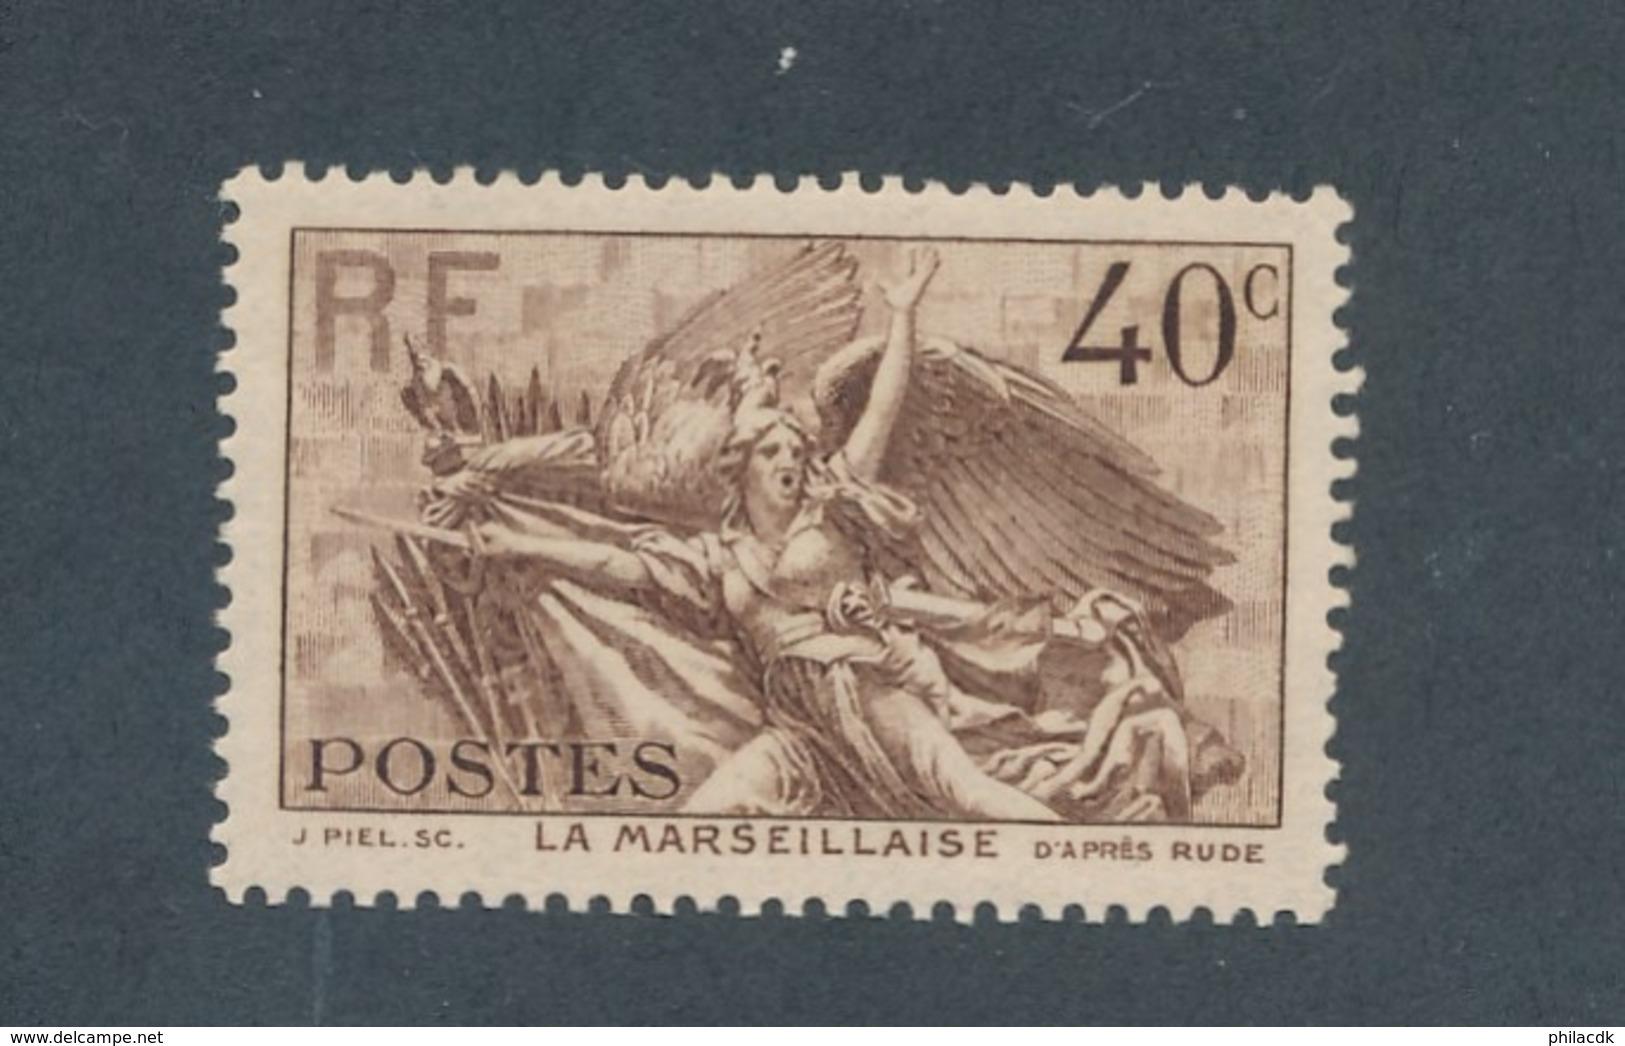 FRANCE - N°YT 315 NEUF** SANS CHARNIERE - COTE YT : 13€ - 1936 - France